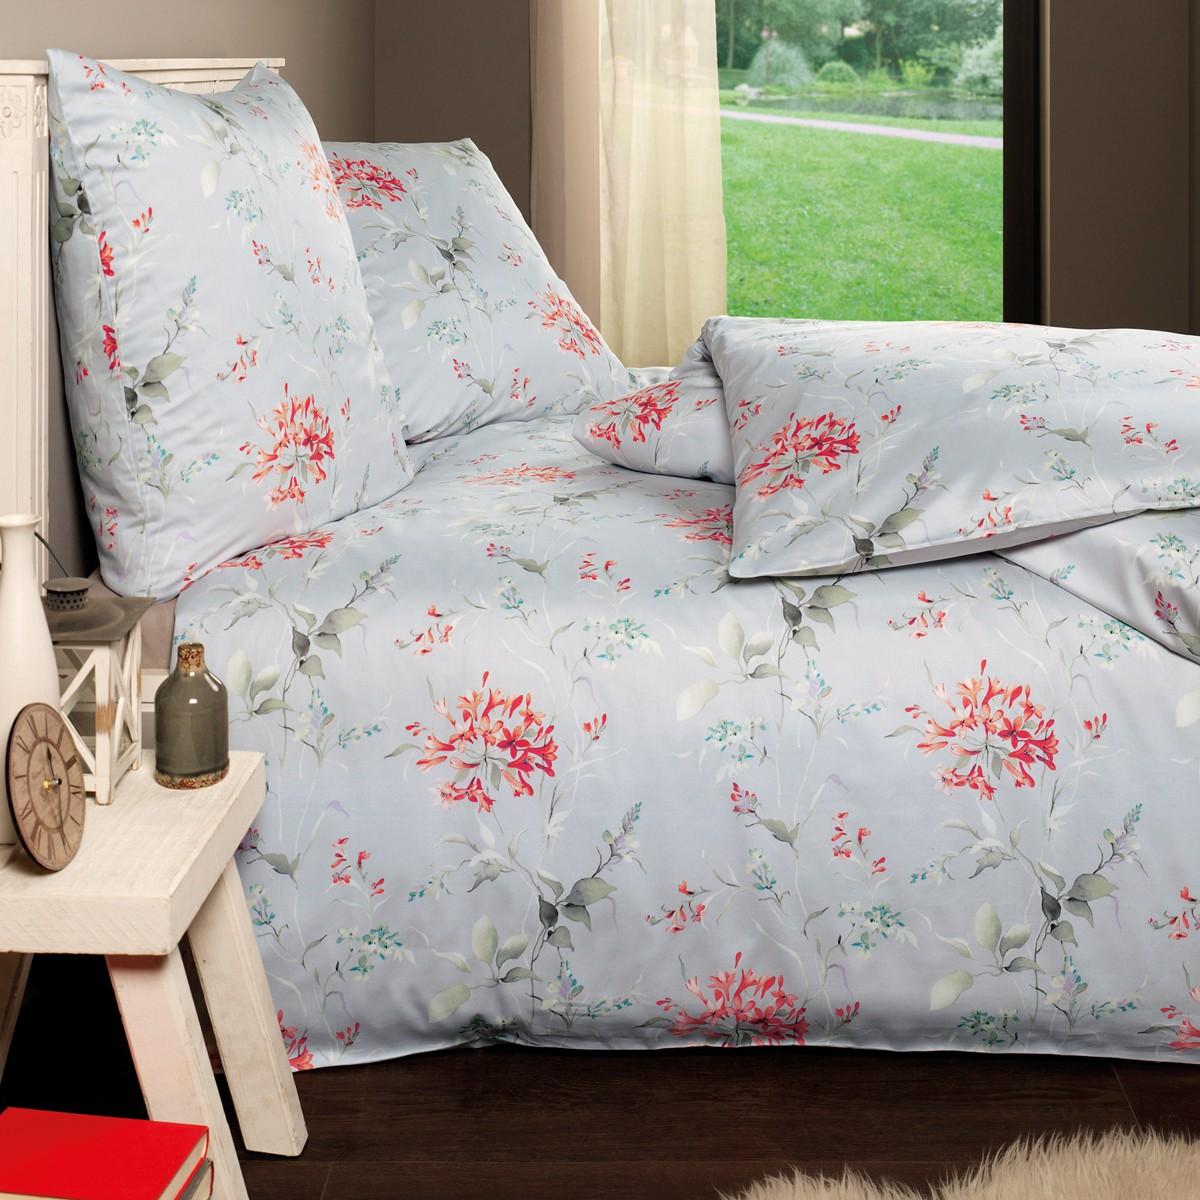 mako satin bettw sche estella freia silber bettw sche mako satin bettw sche. Black Bedroom Furniture Sets. Home Design Ideas